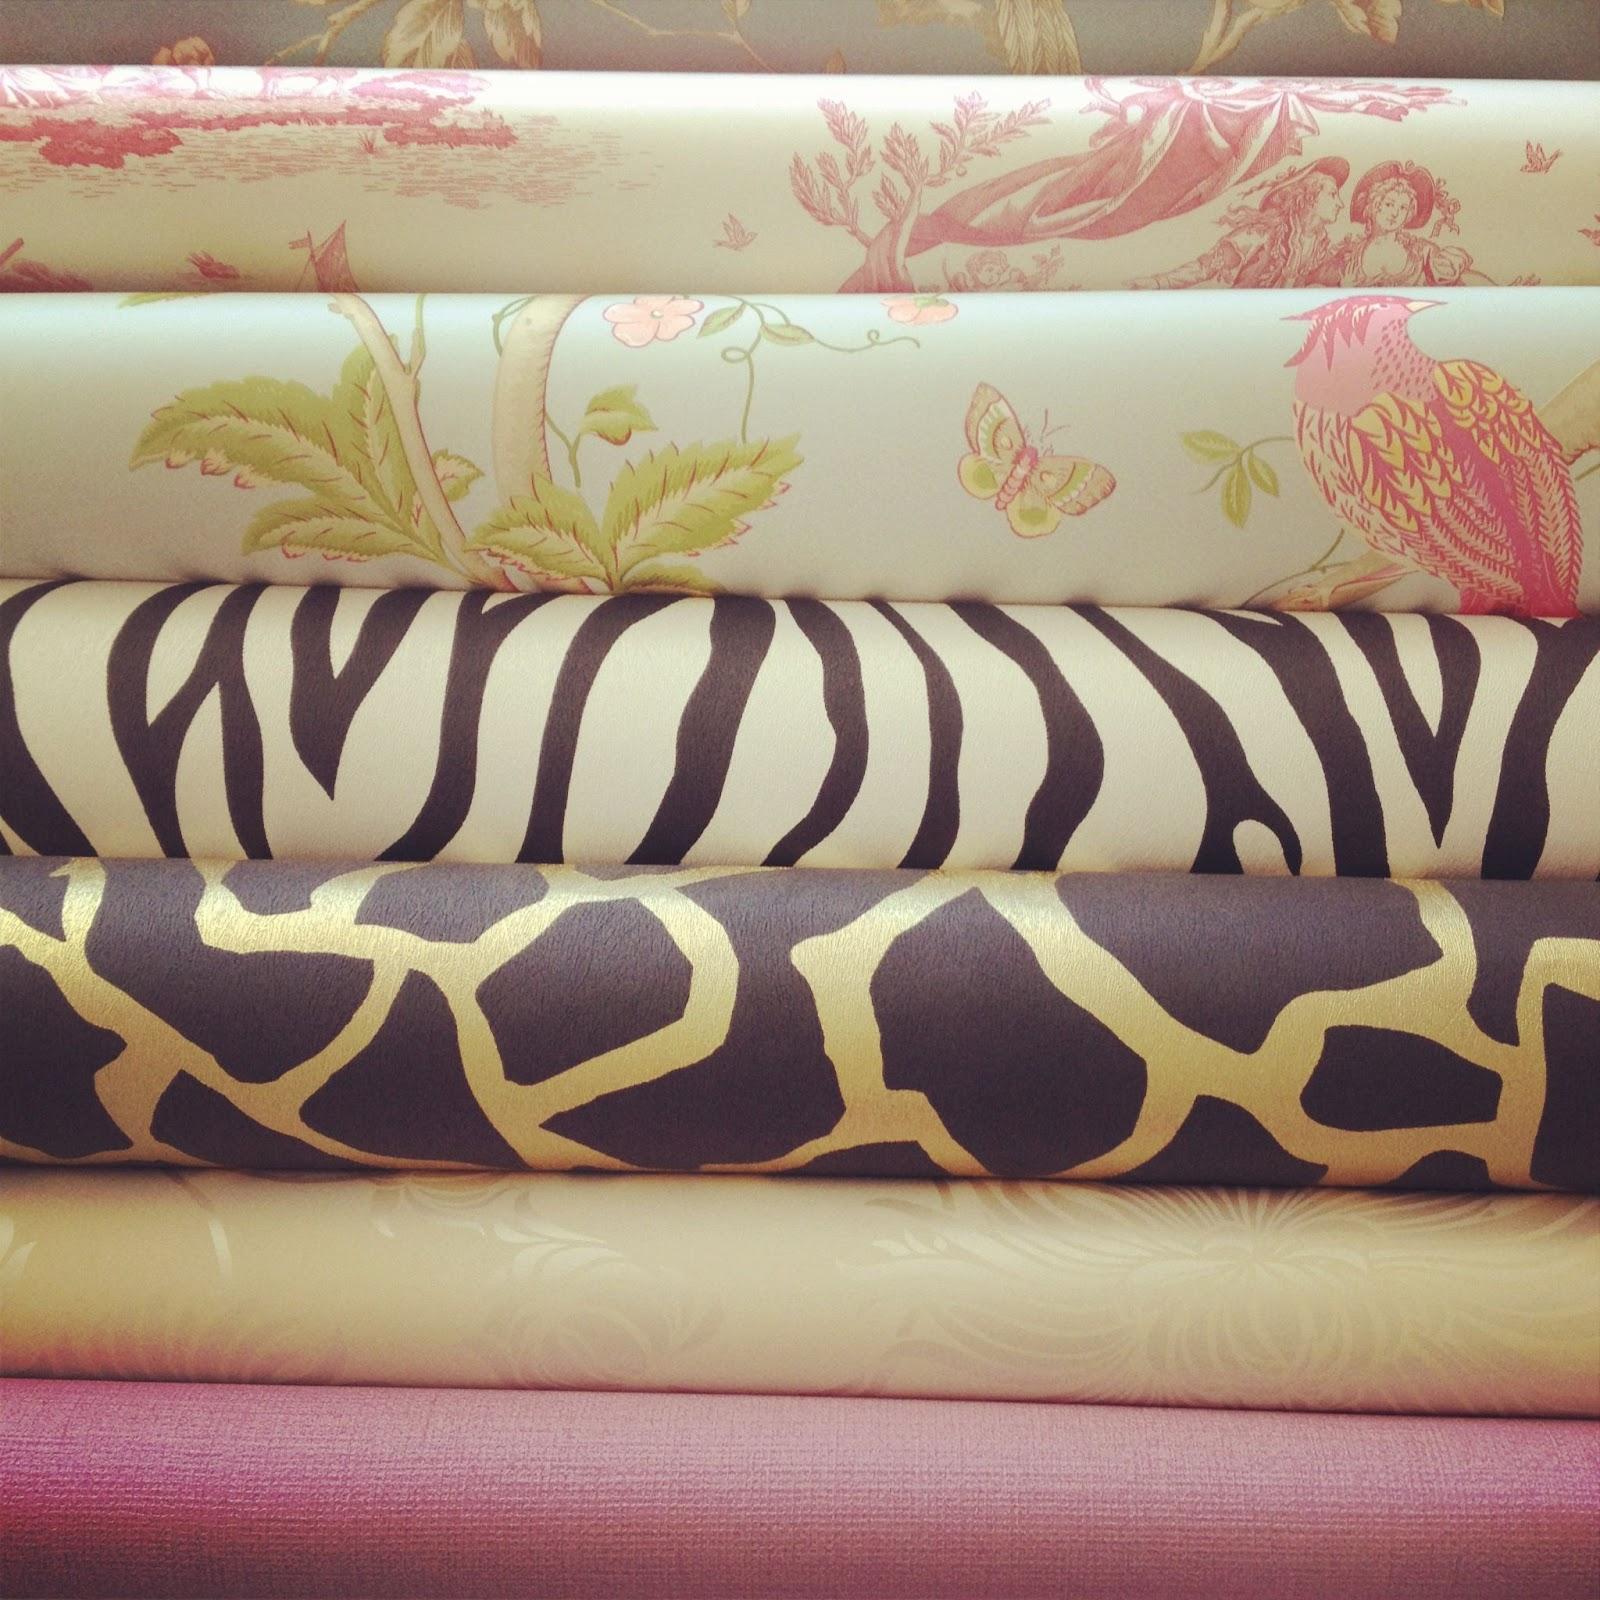 http://2.bp.blogspot.com/-AJ-s7Uh7hKA/UCR9Wjtm-vI/AAAAAAAADC0/ow_u-rHUo-g/s1600/wallpaper%2Bmasters.jpg